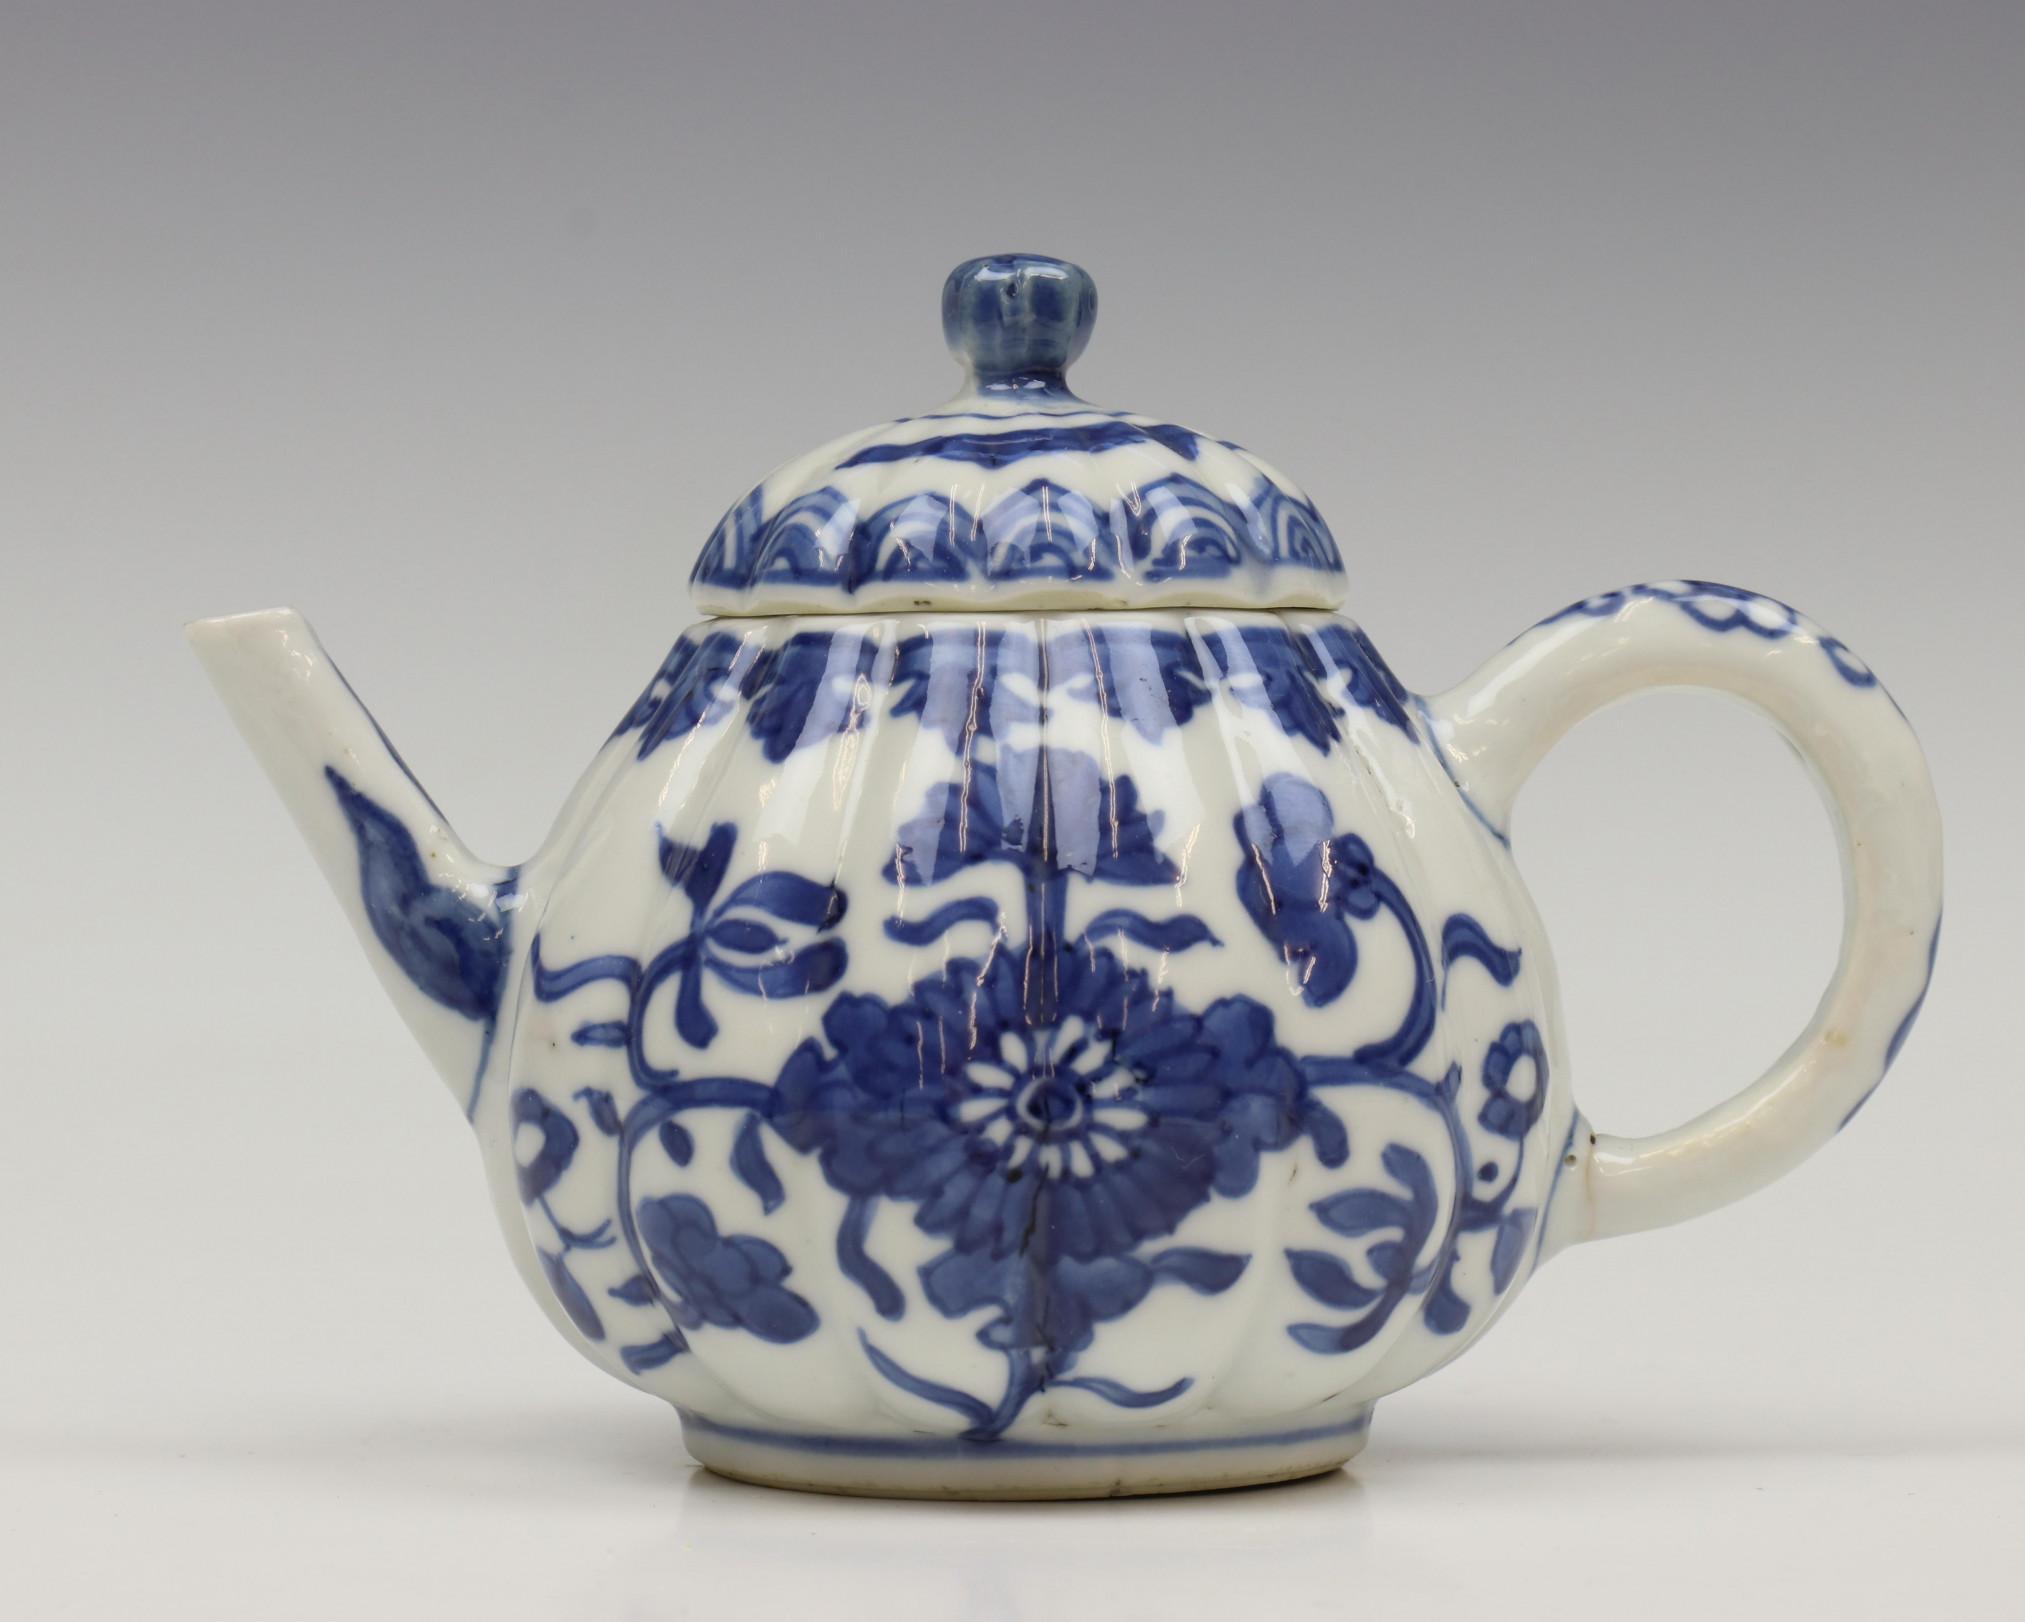 China, blauw-wit porseleinen gelobd trekpotje, Kangxi, - Image 2 of 6